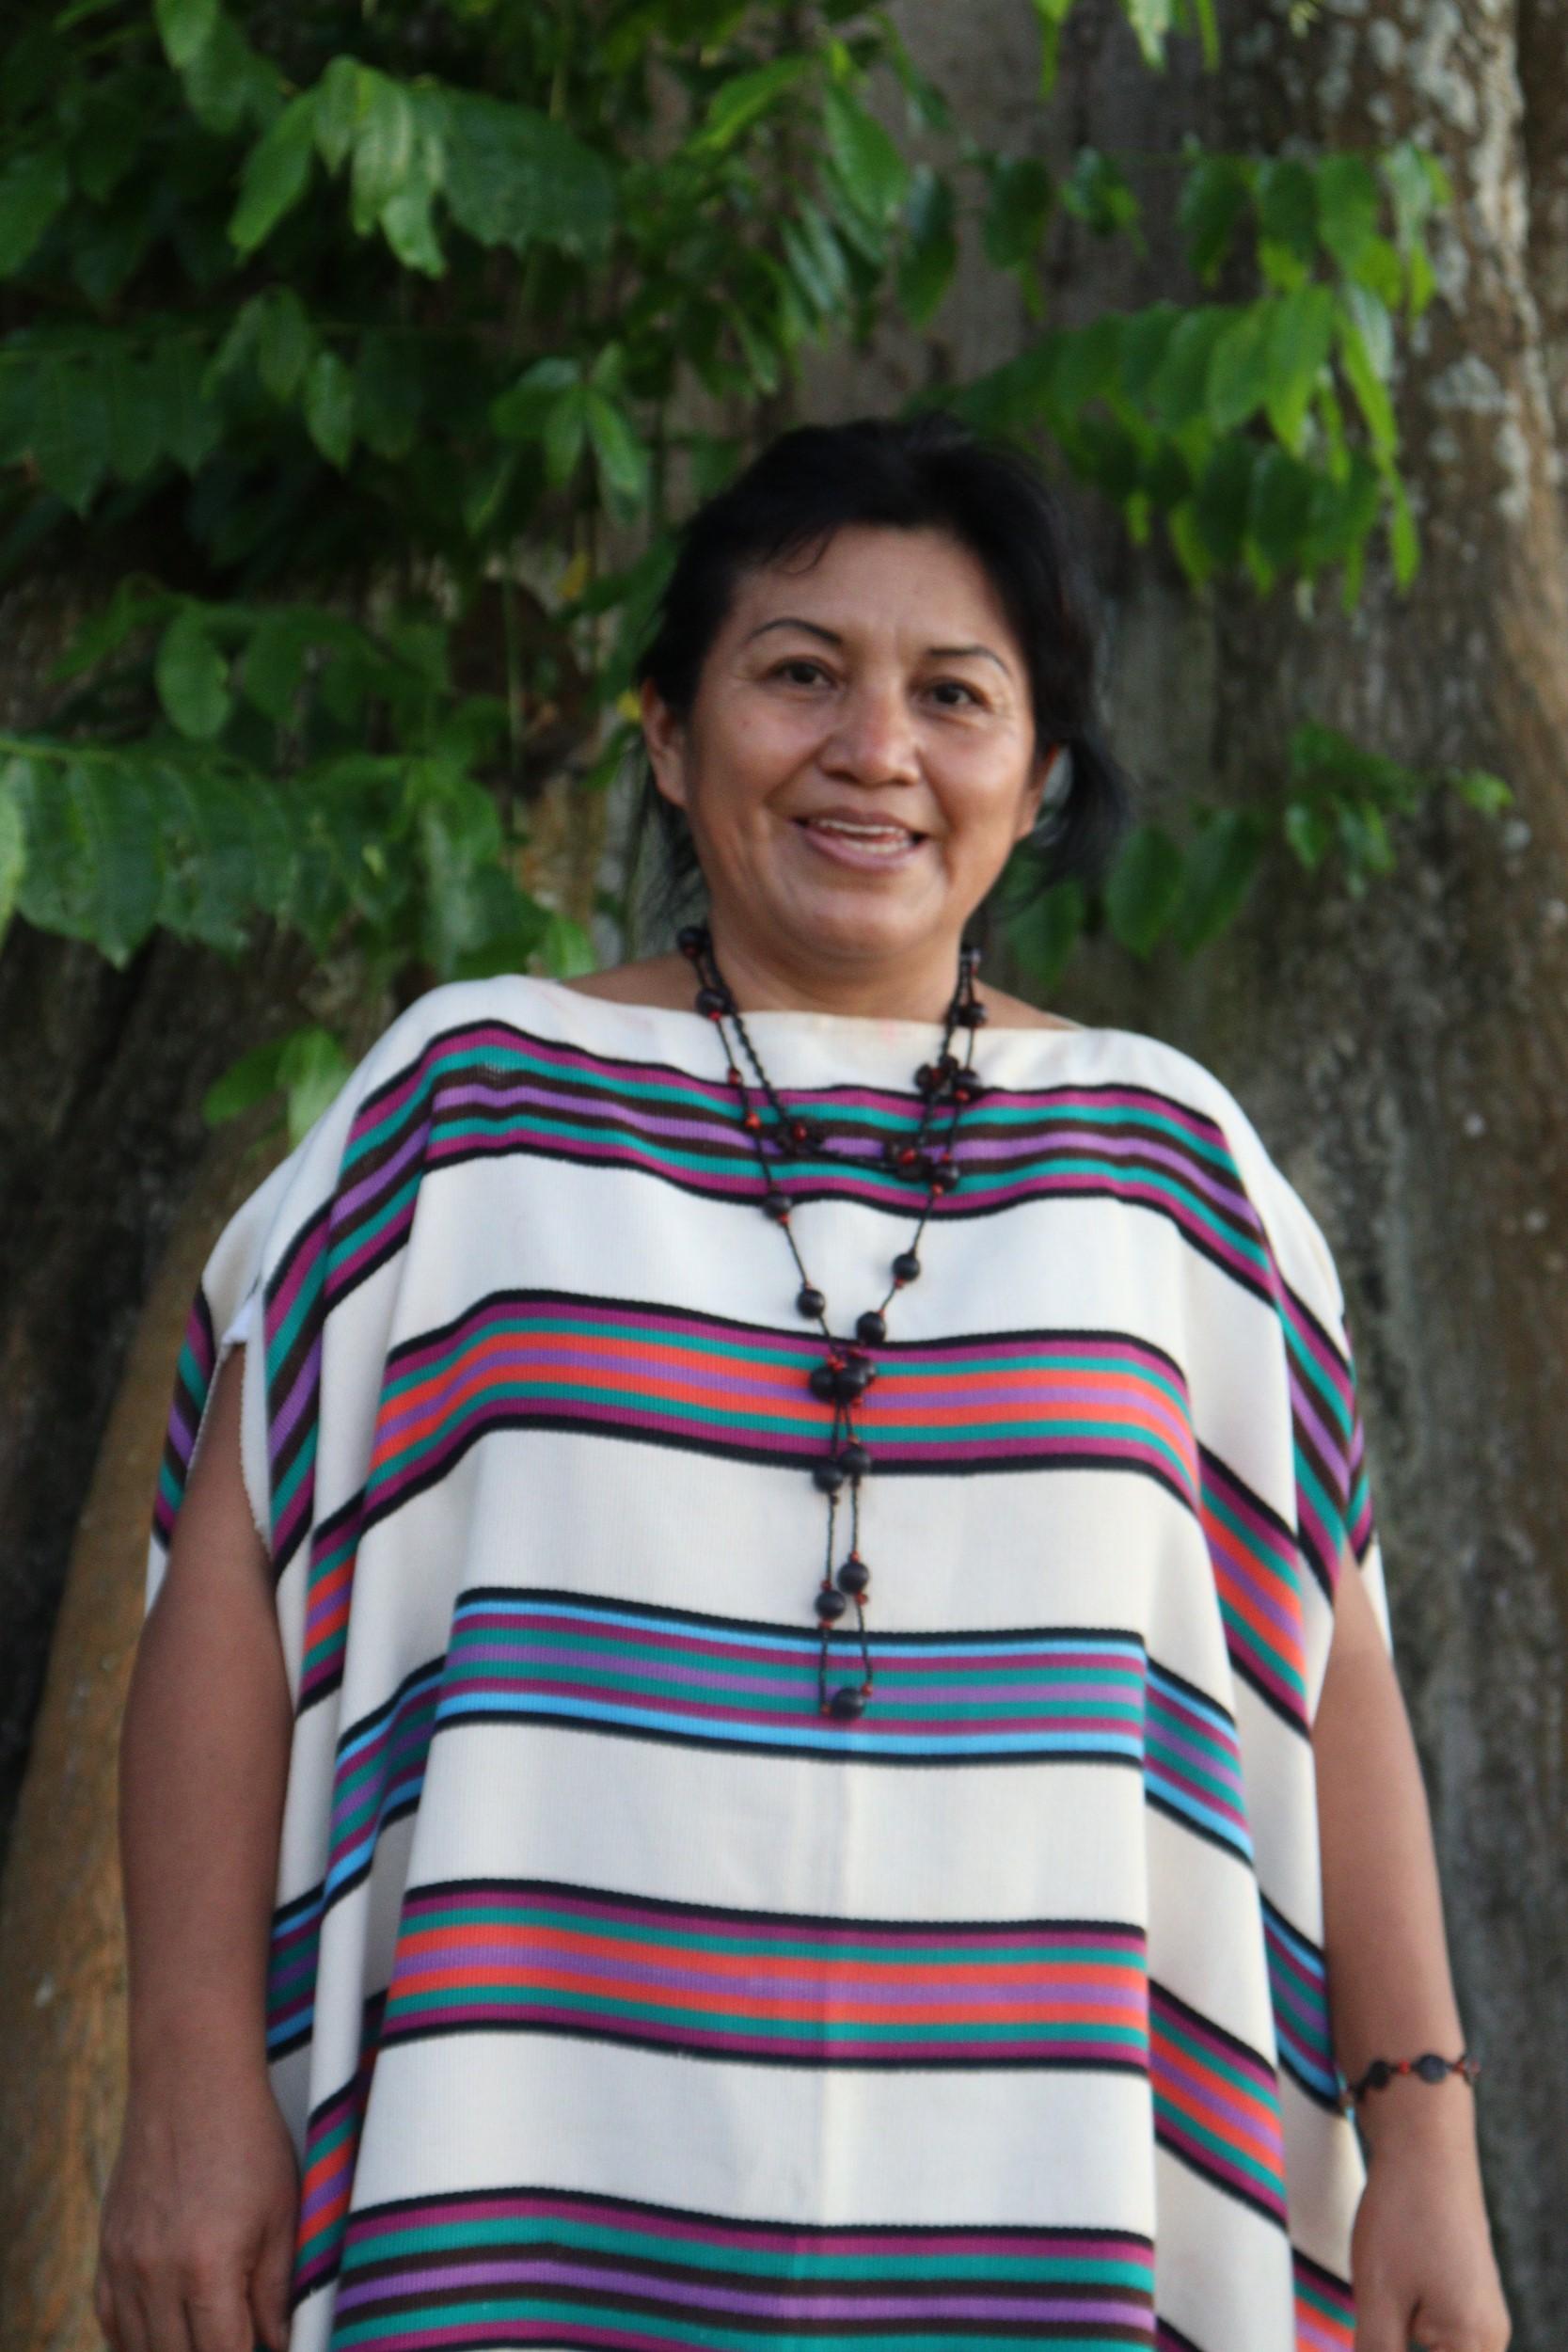 https://mk0itemsssrcorgqb419.kinstacdn.com/wp-content/uploads/2021/08/SSRC-President-of-FABU-Susana-Silva-Morales-Credits_-Jackeline-Mendez.jpg